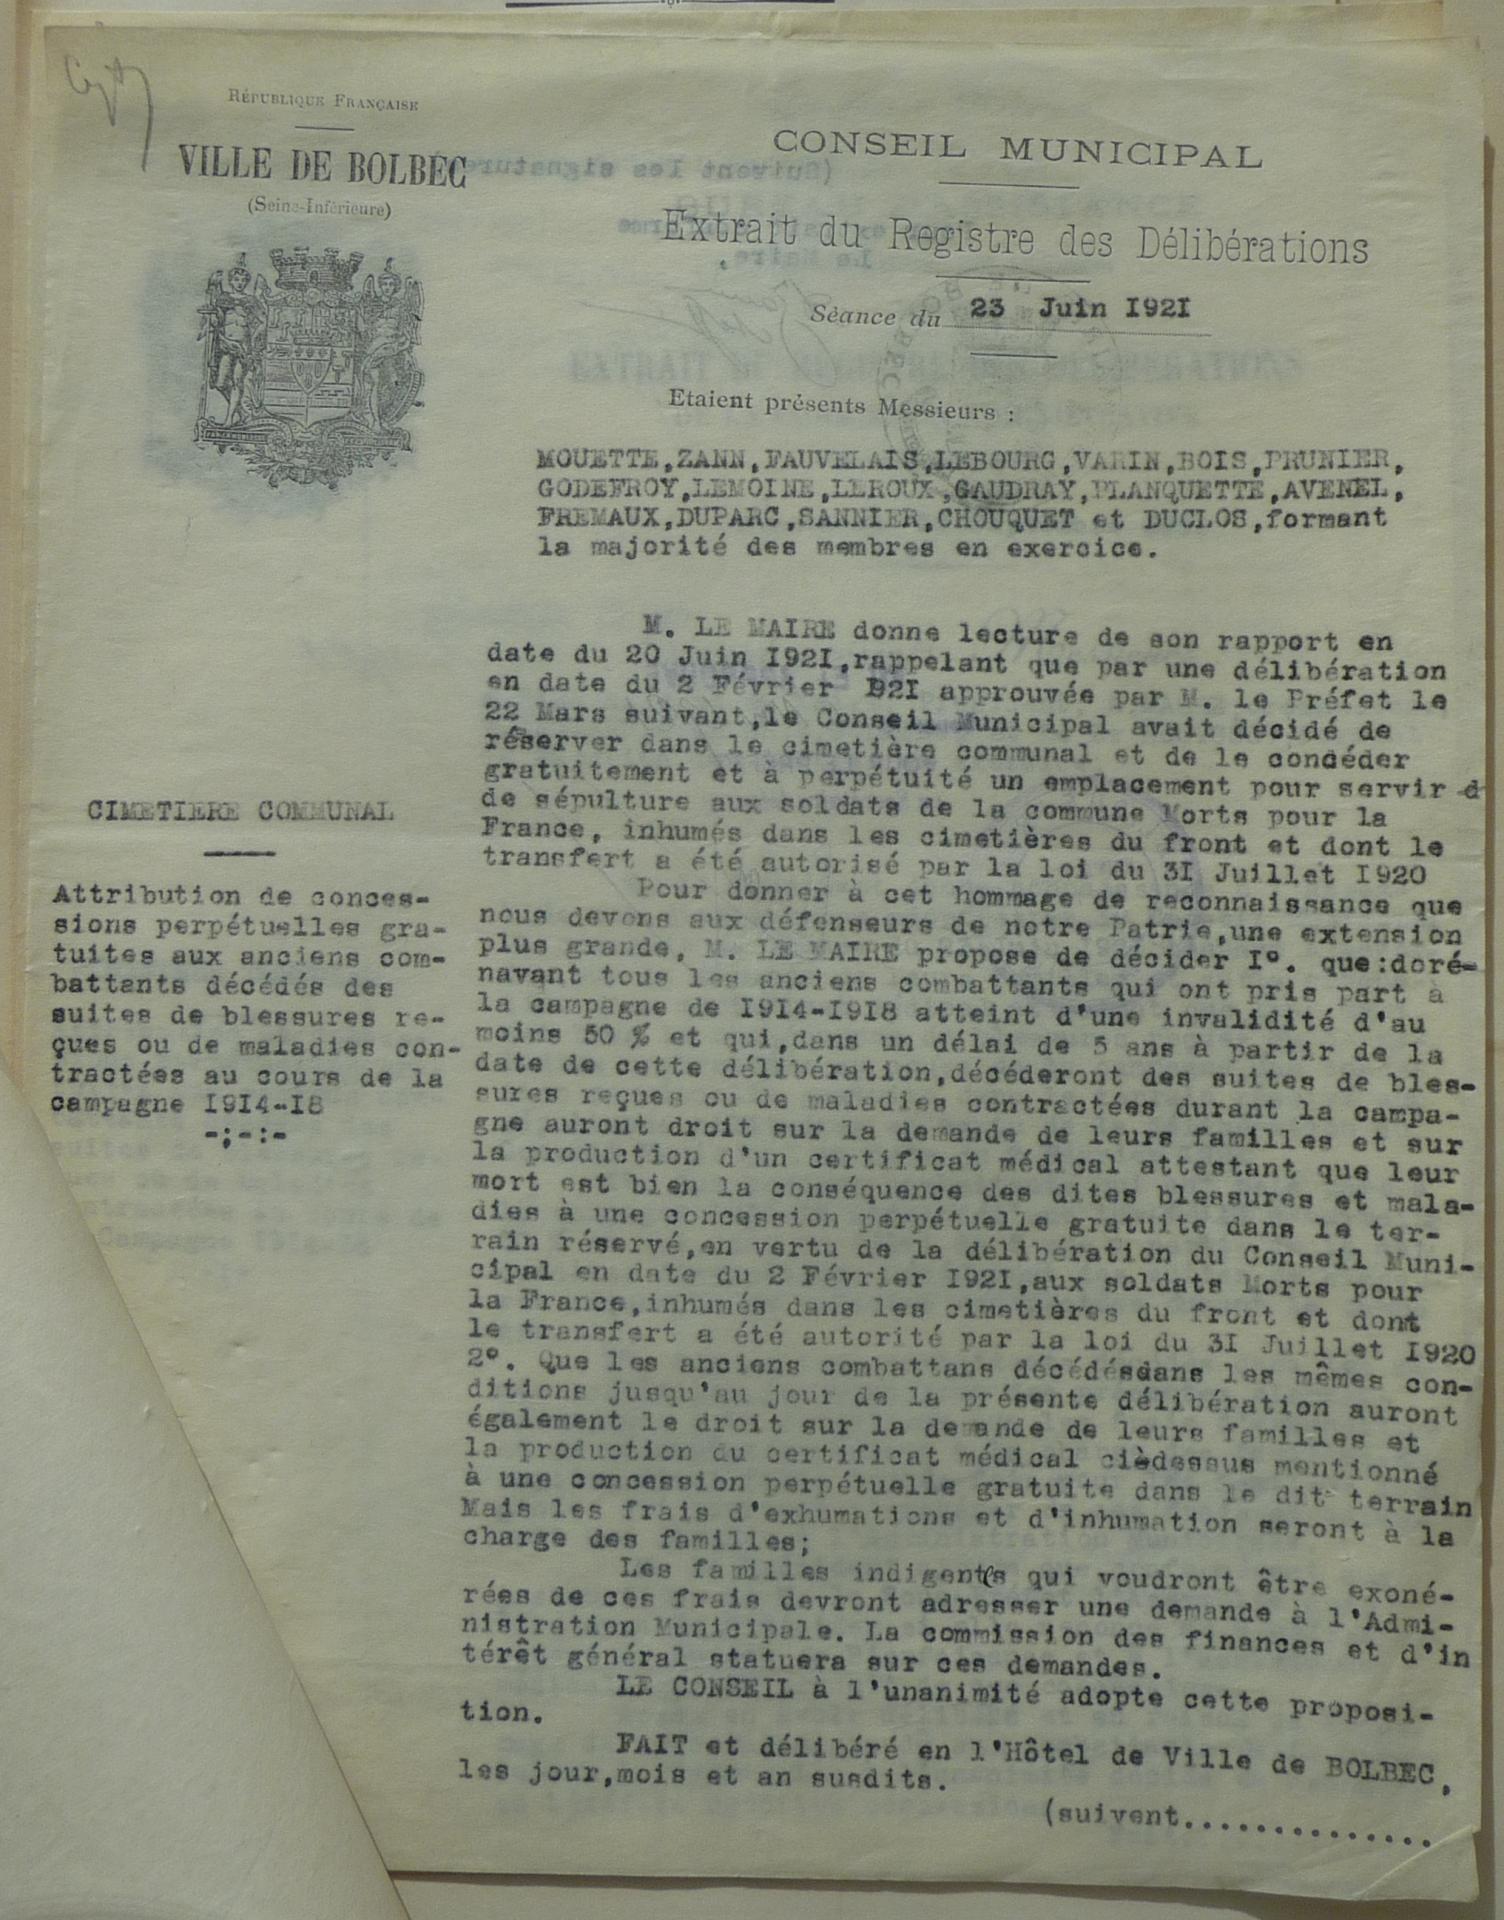 19210623 deliberation cm